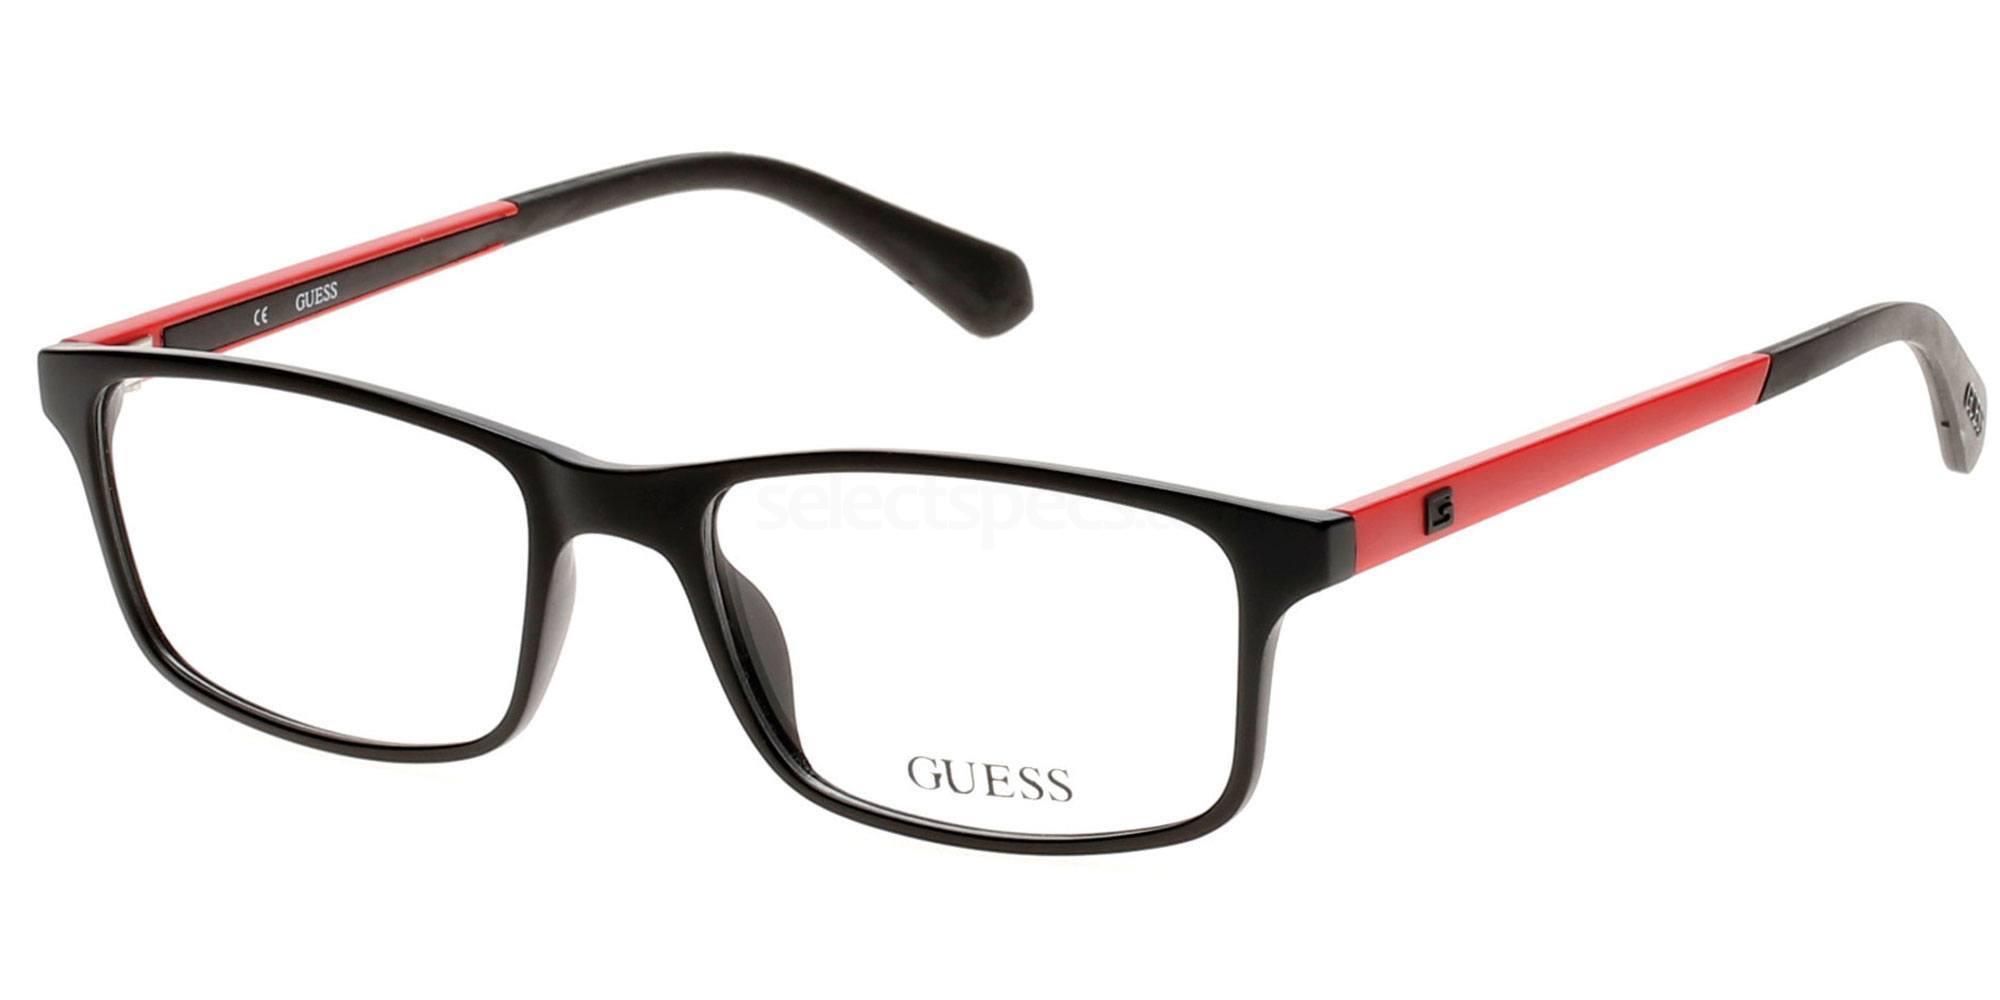 002 GU1872 Glasses, Guess